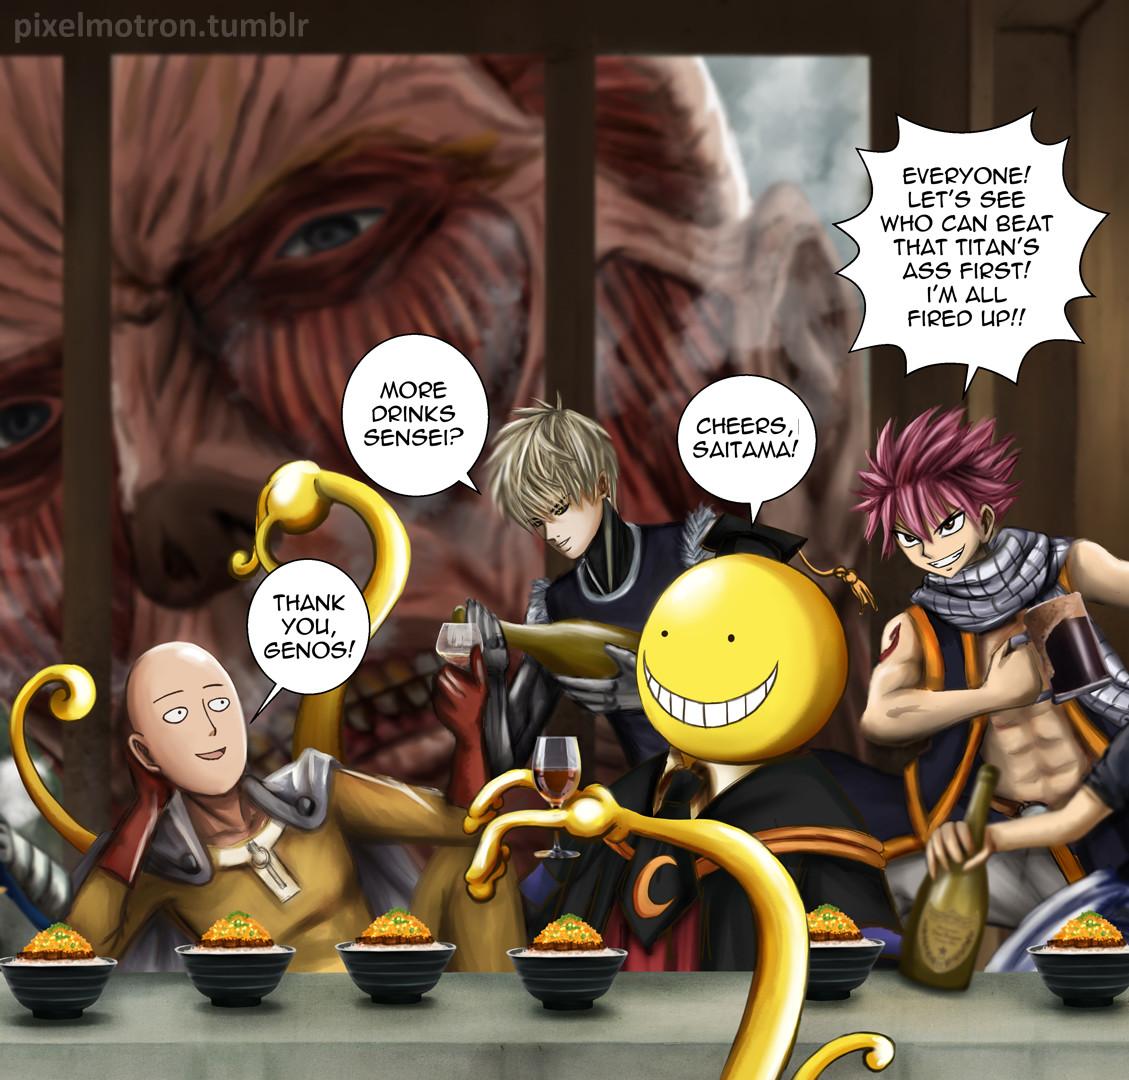 Mo Izarin The Last Supper Anime Crossover Version